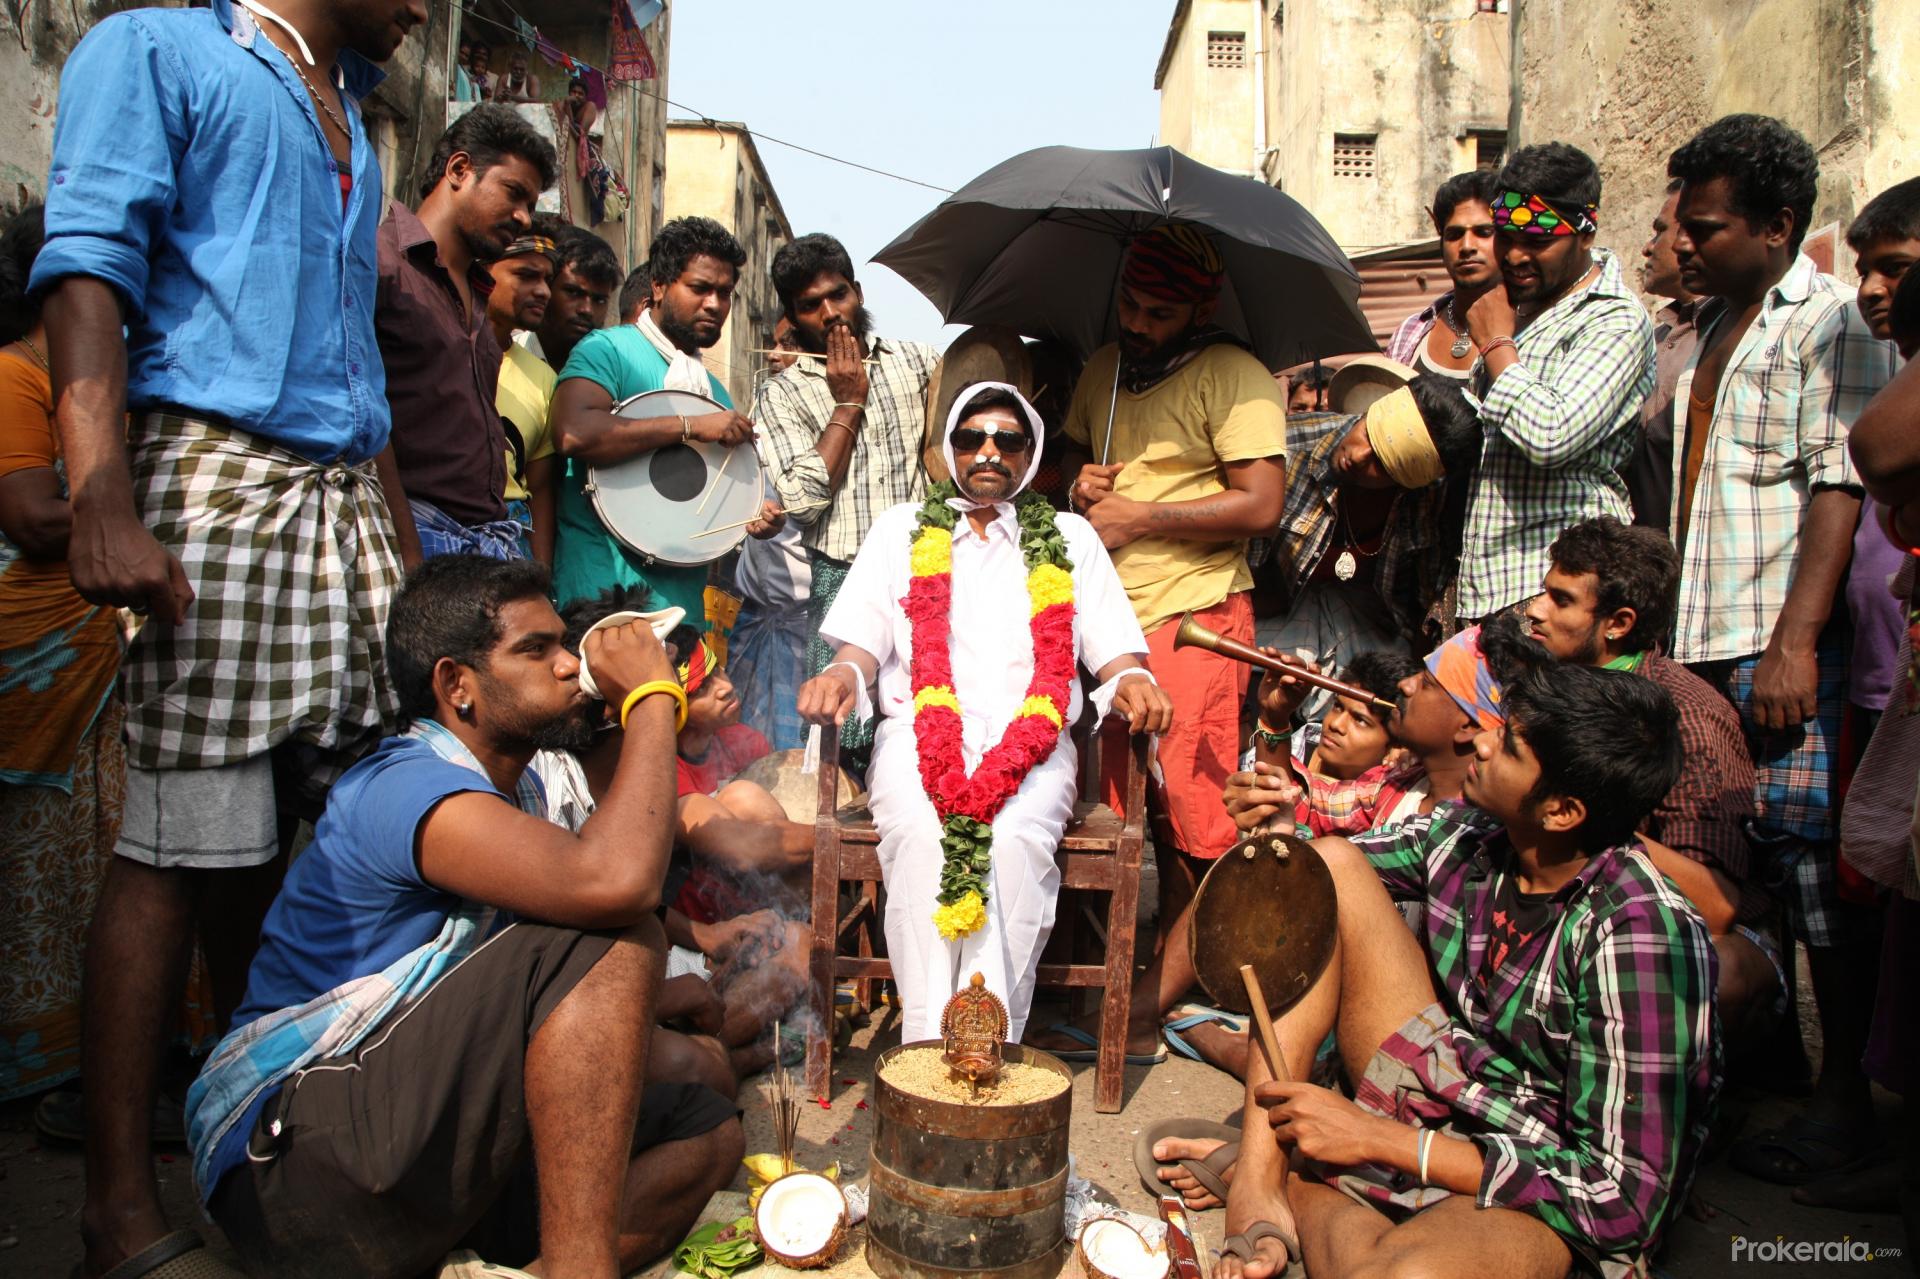 Mgr sivaji rajini kamal movie video song / Om shanti om film